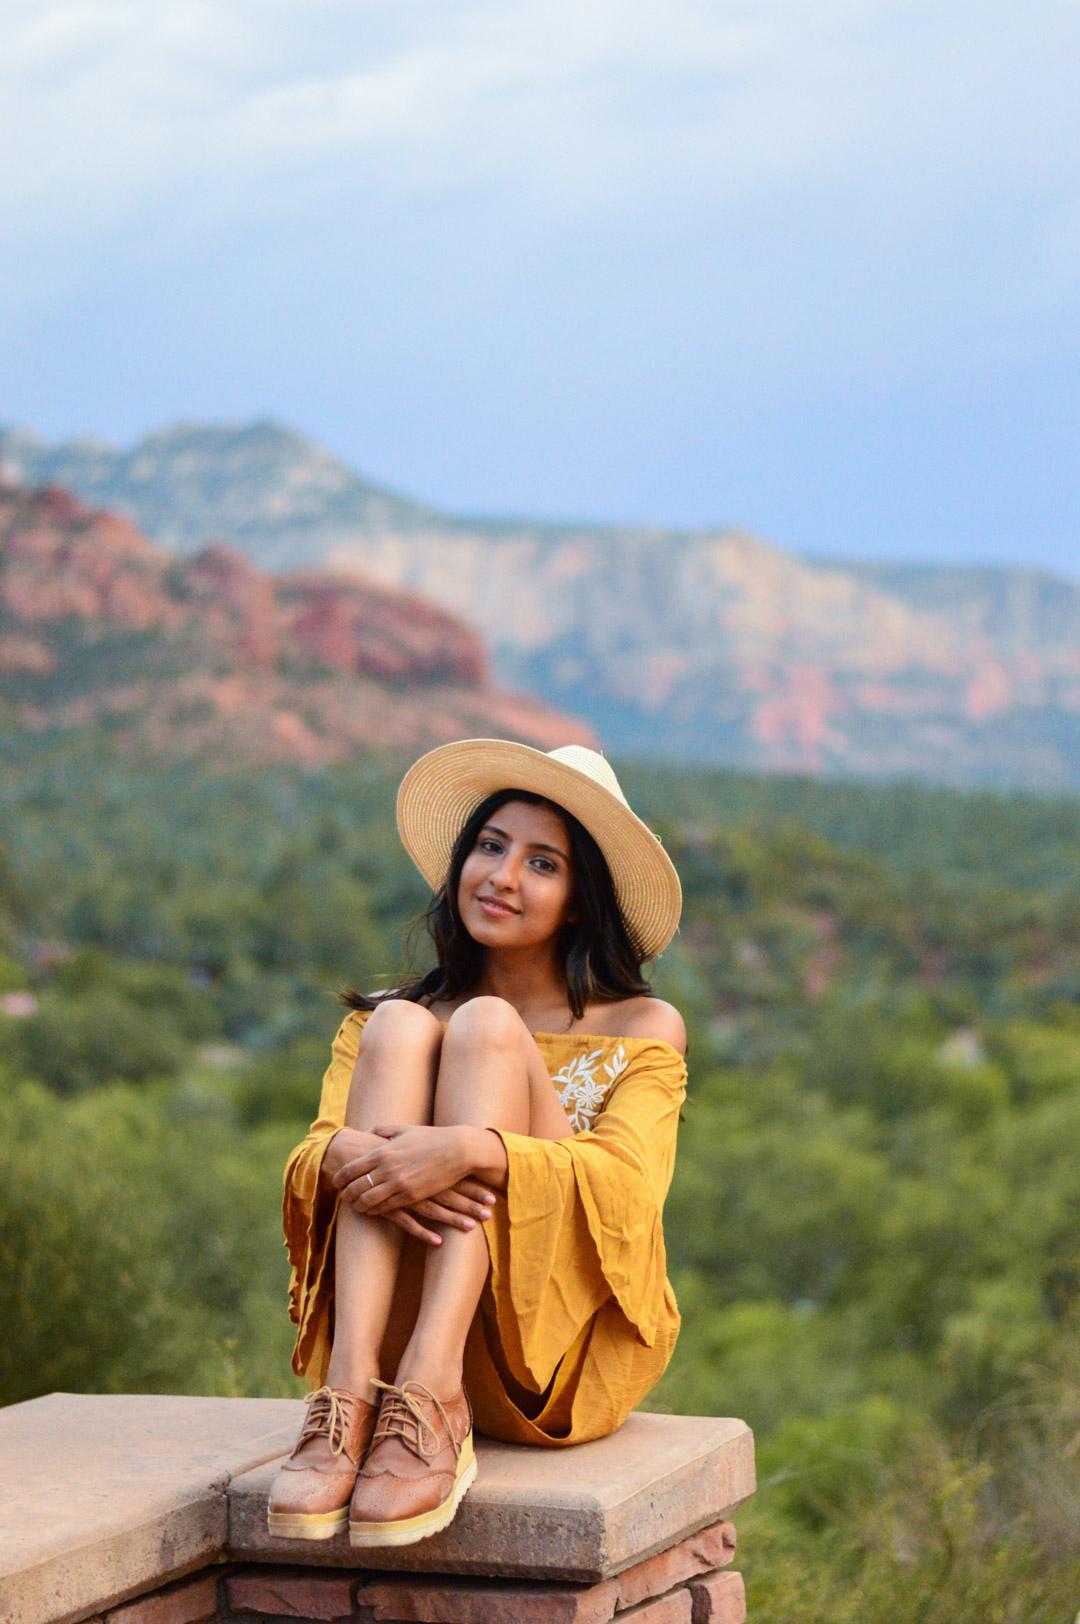 sedona-arizona-mustard-yellow-marigold-romper-travel-blogger-outfit 11